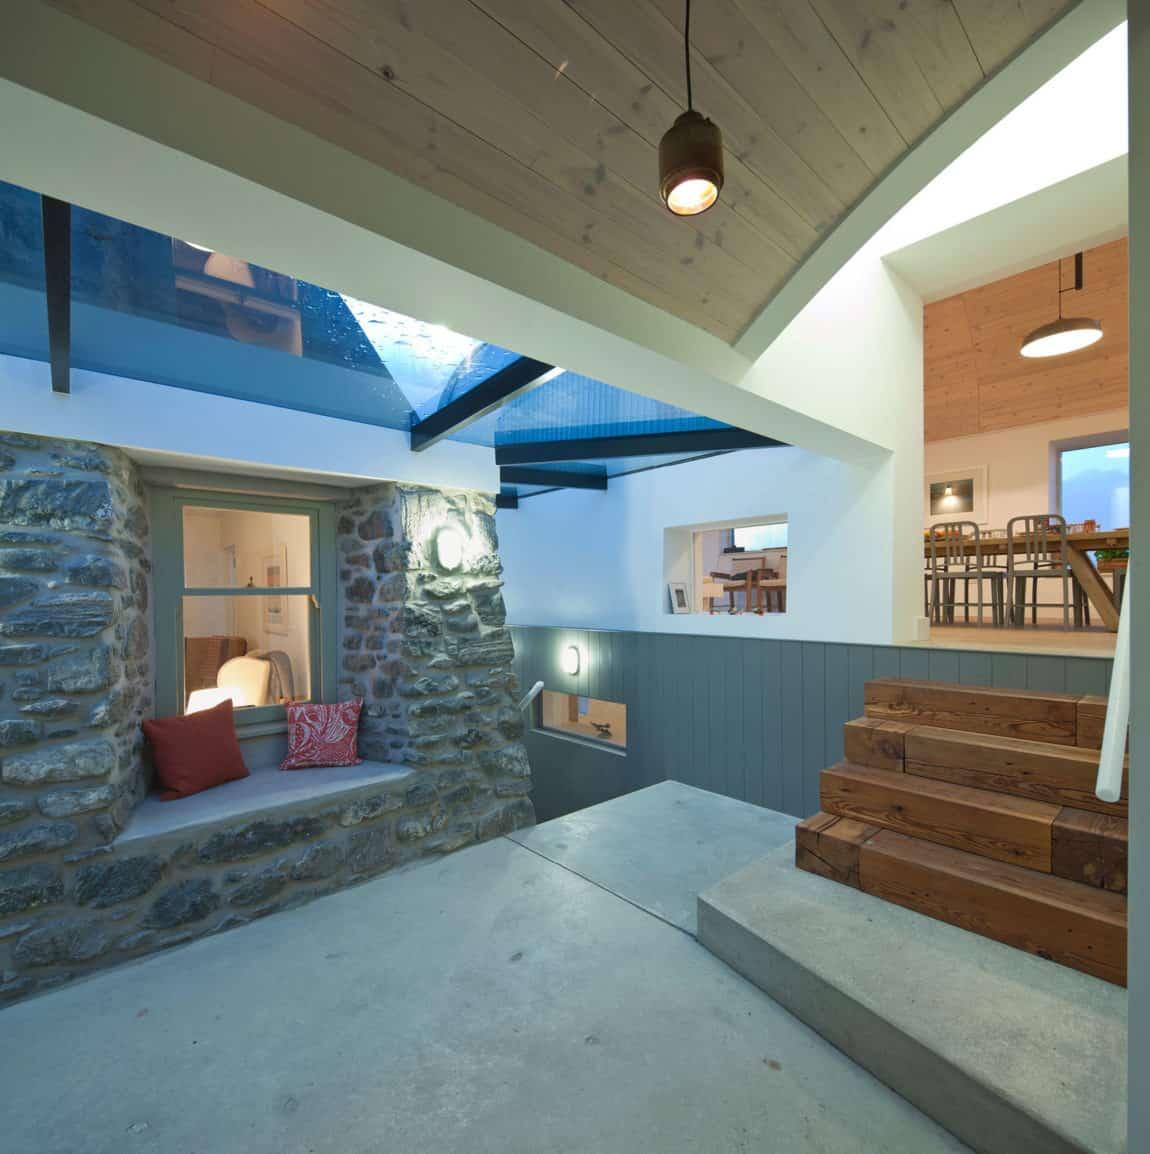 House Number 7 by Denizen Works (23)